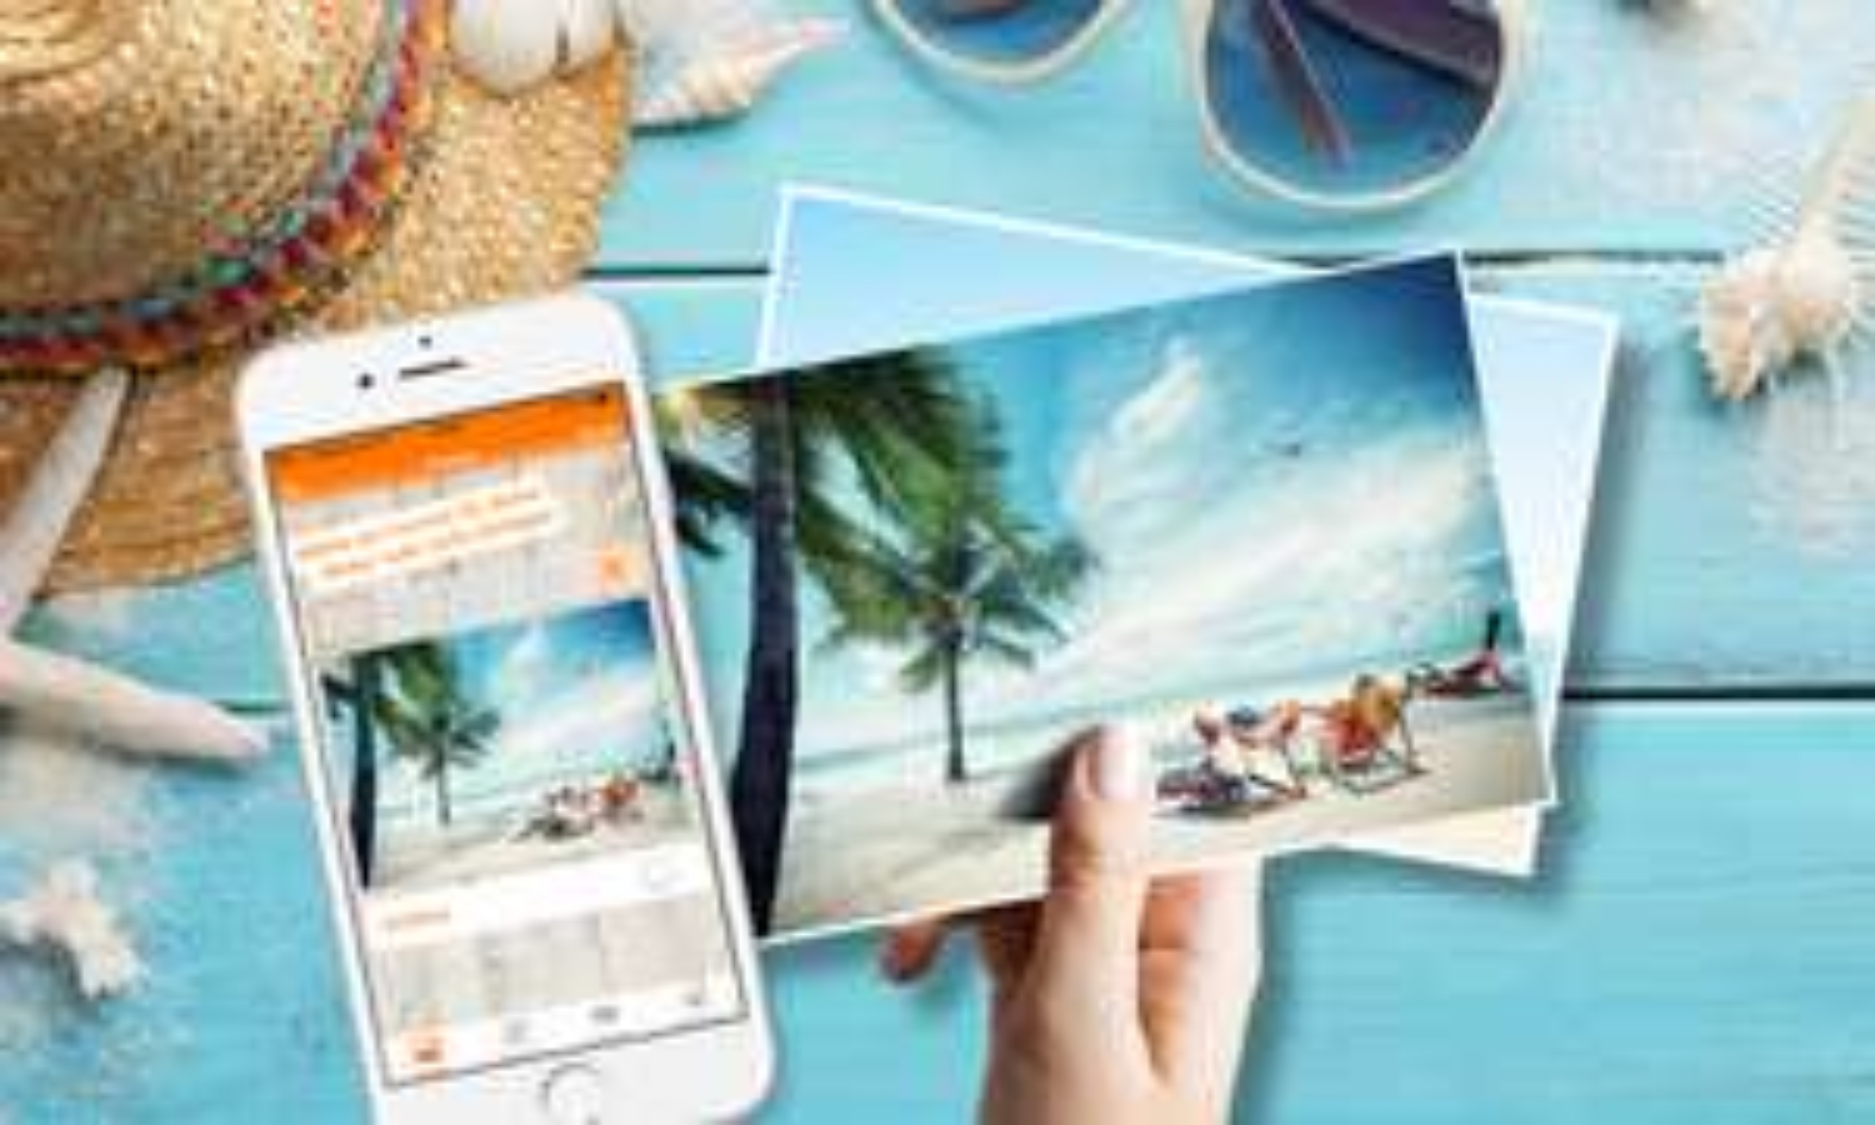 [Android & IOS] GRATIS statt 1,99€ - Postkarte weltweit versenden *Postando App*